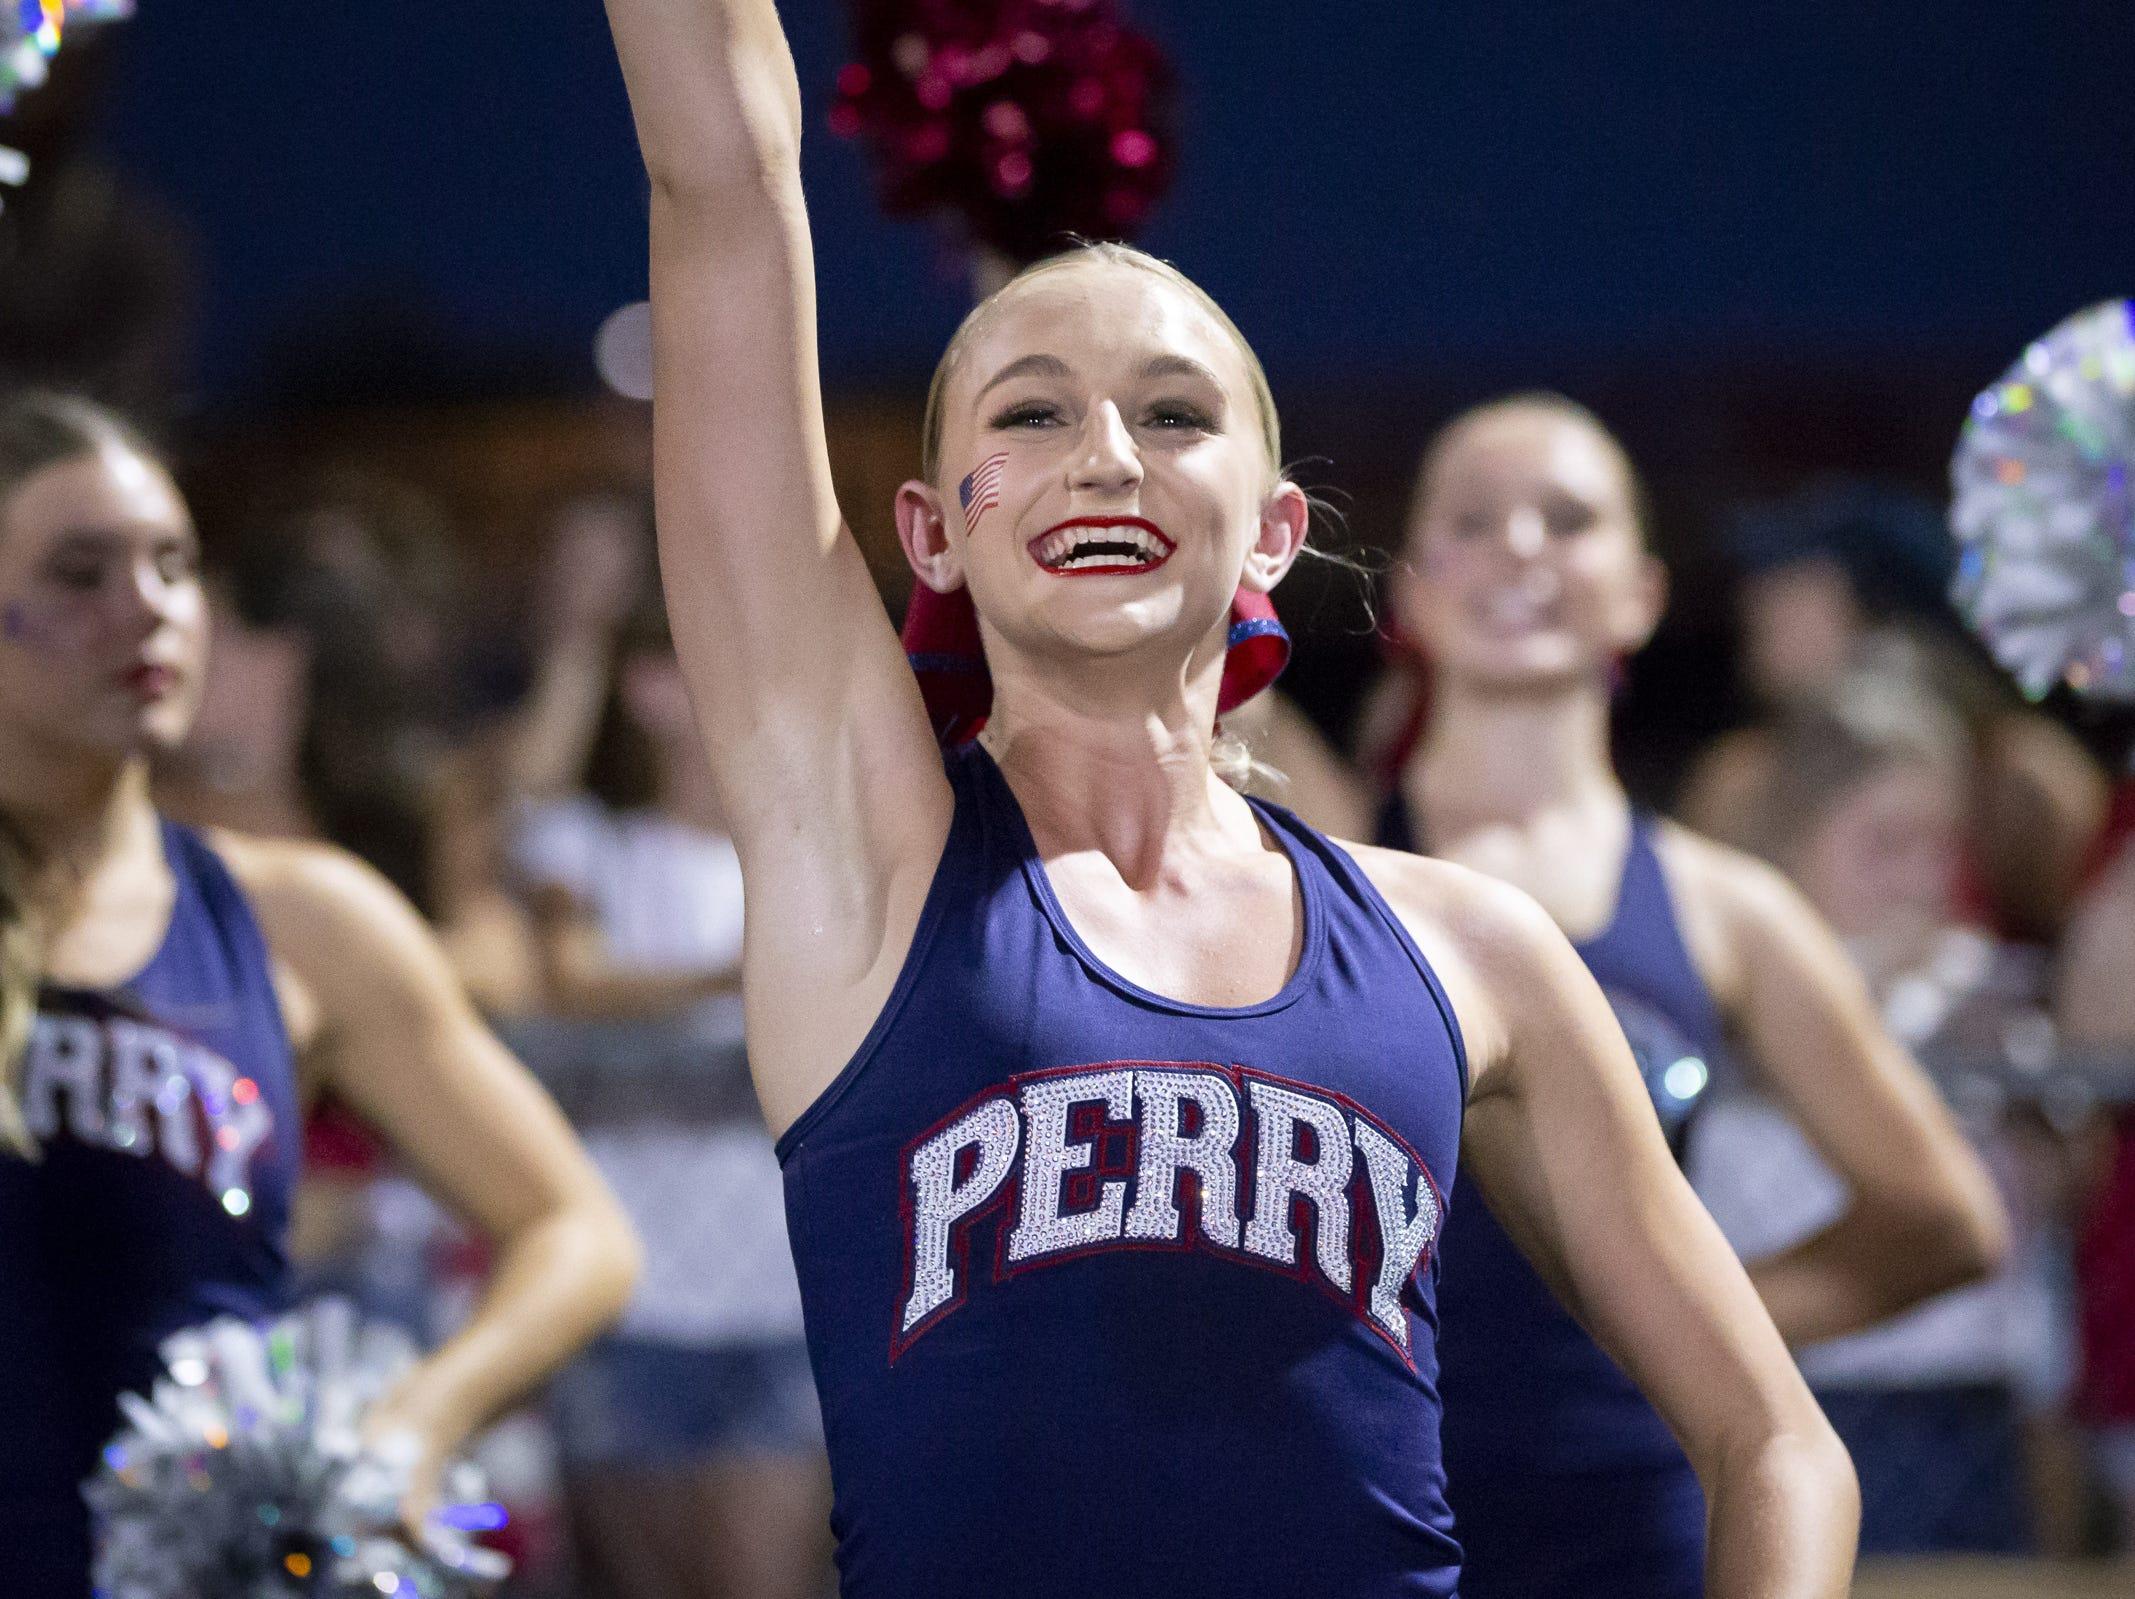 A Perry cheerleader cheers during the game against the Pinnacle Pioneers at Pinnacle High School on Friday, August 17, 2018 in Phoenix, Arizona.